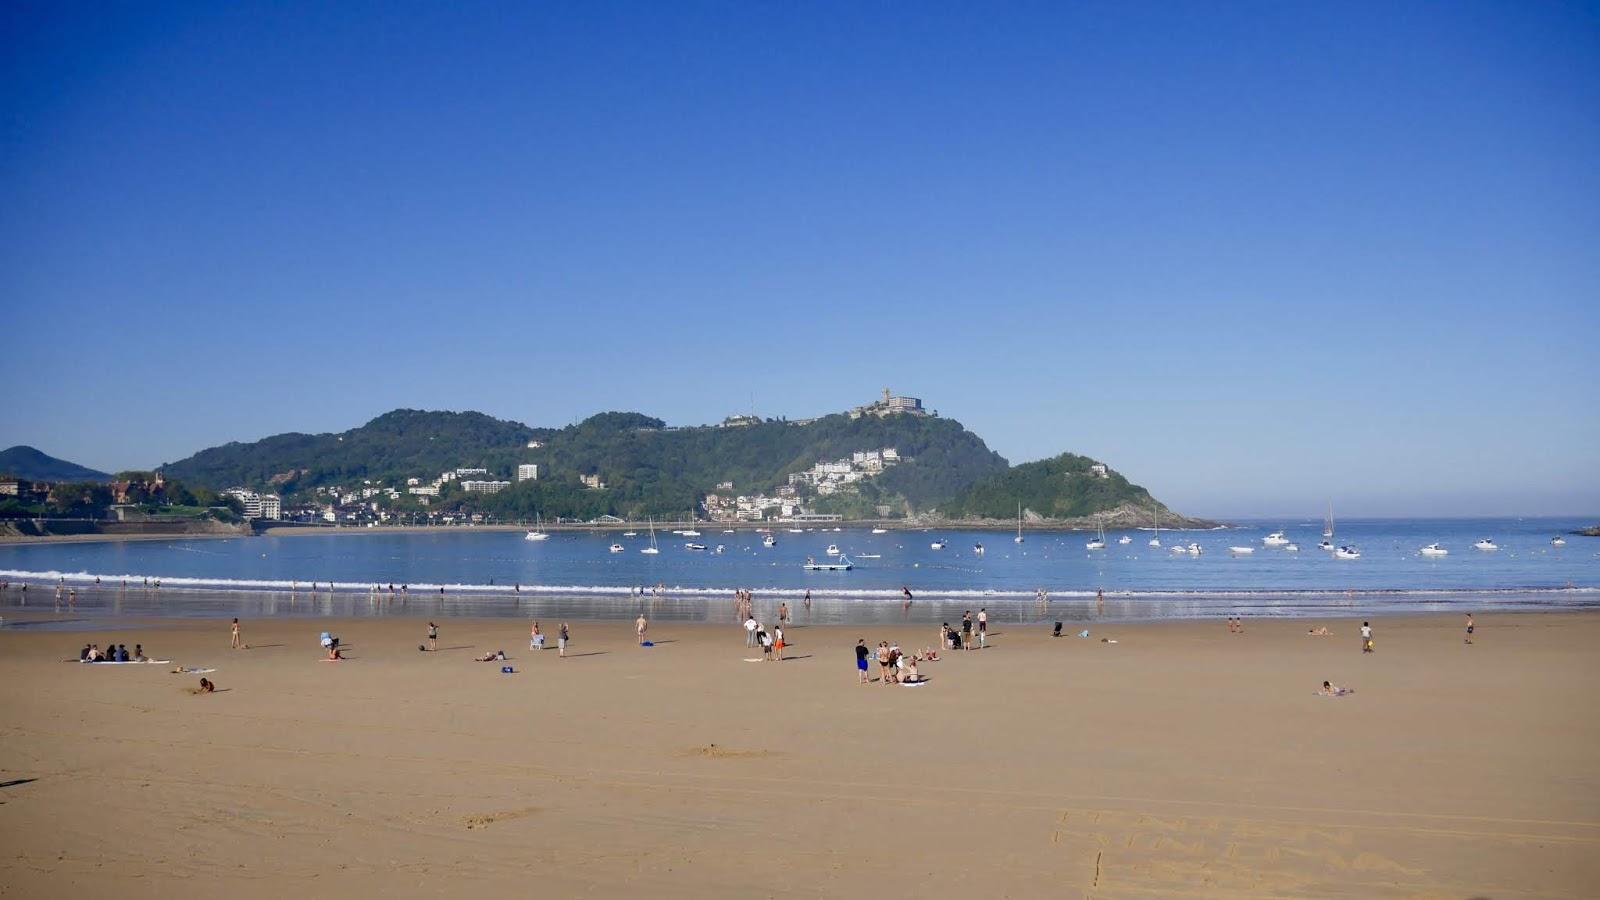 Playa de la Concha San Sebastian Pays Basque Espagne